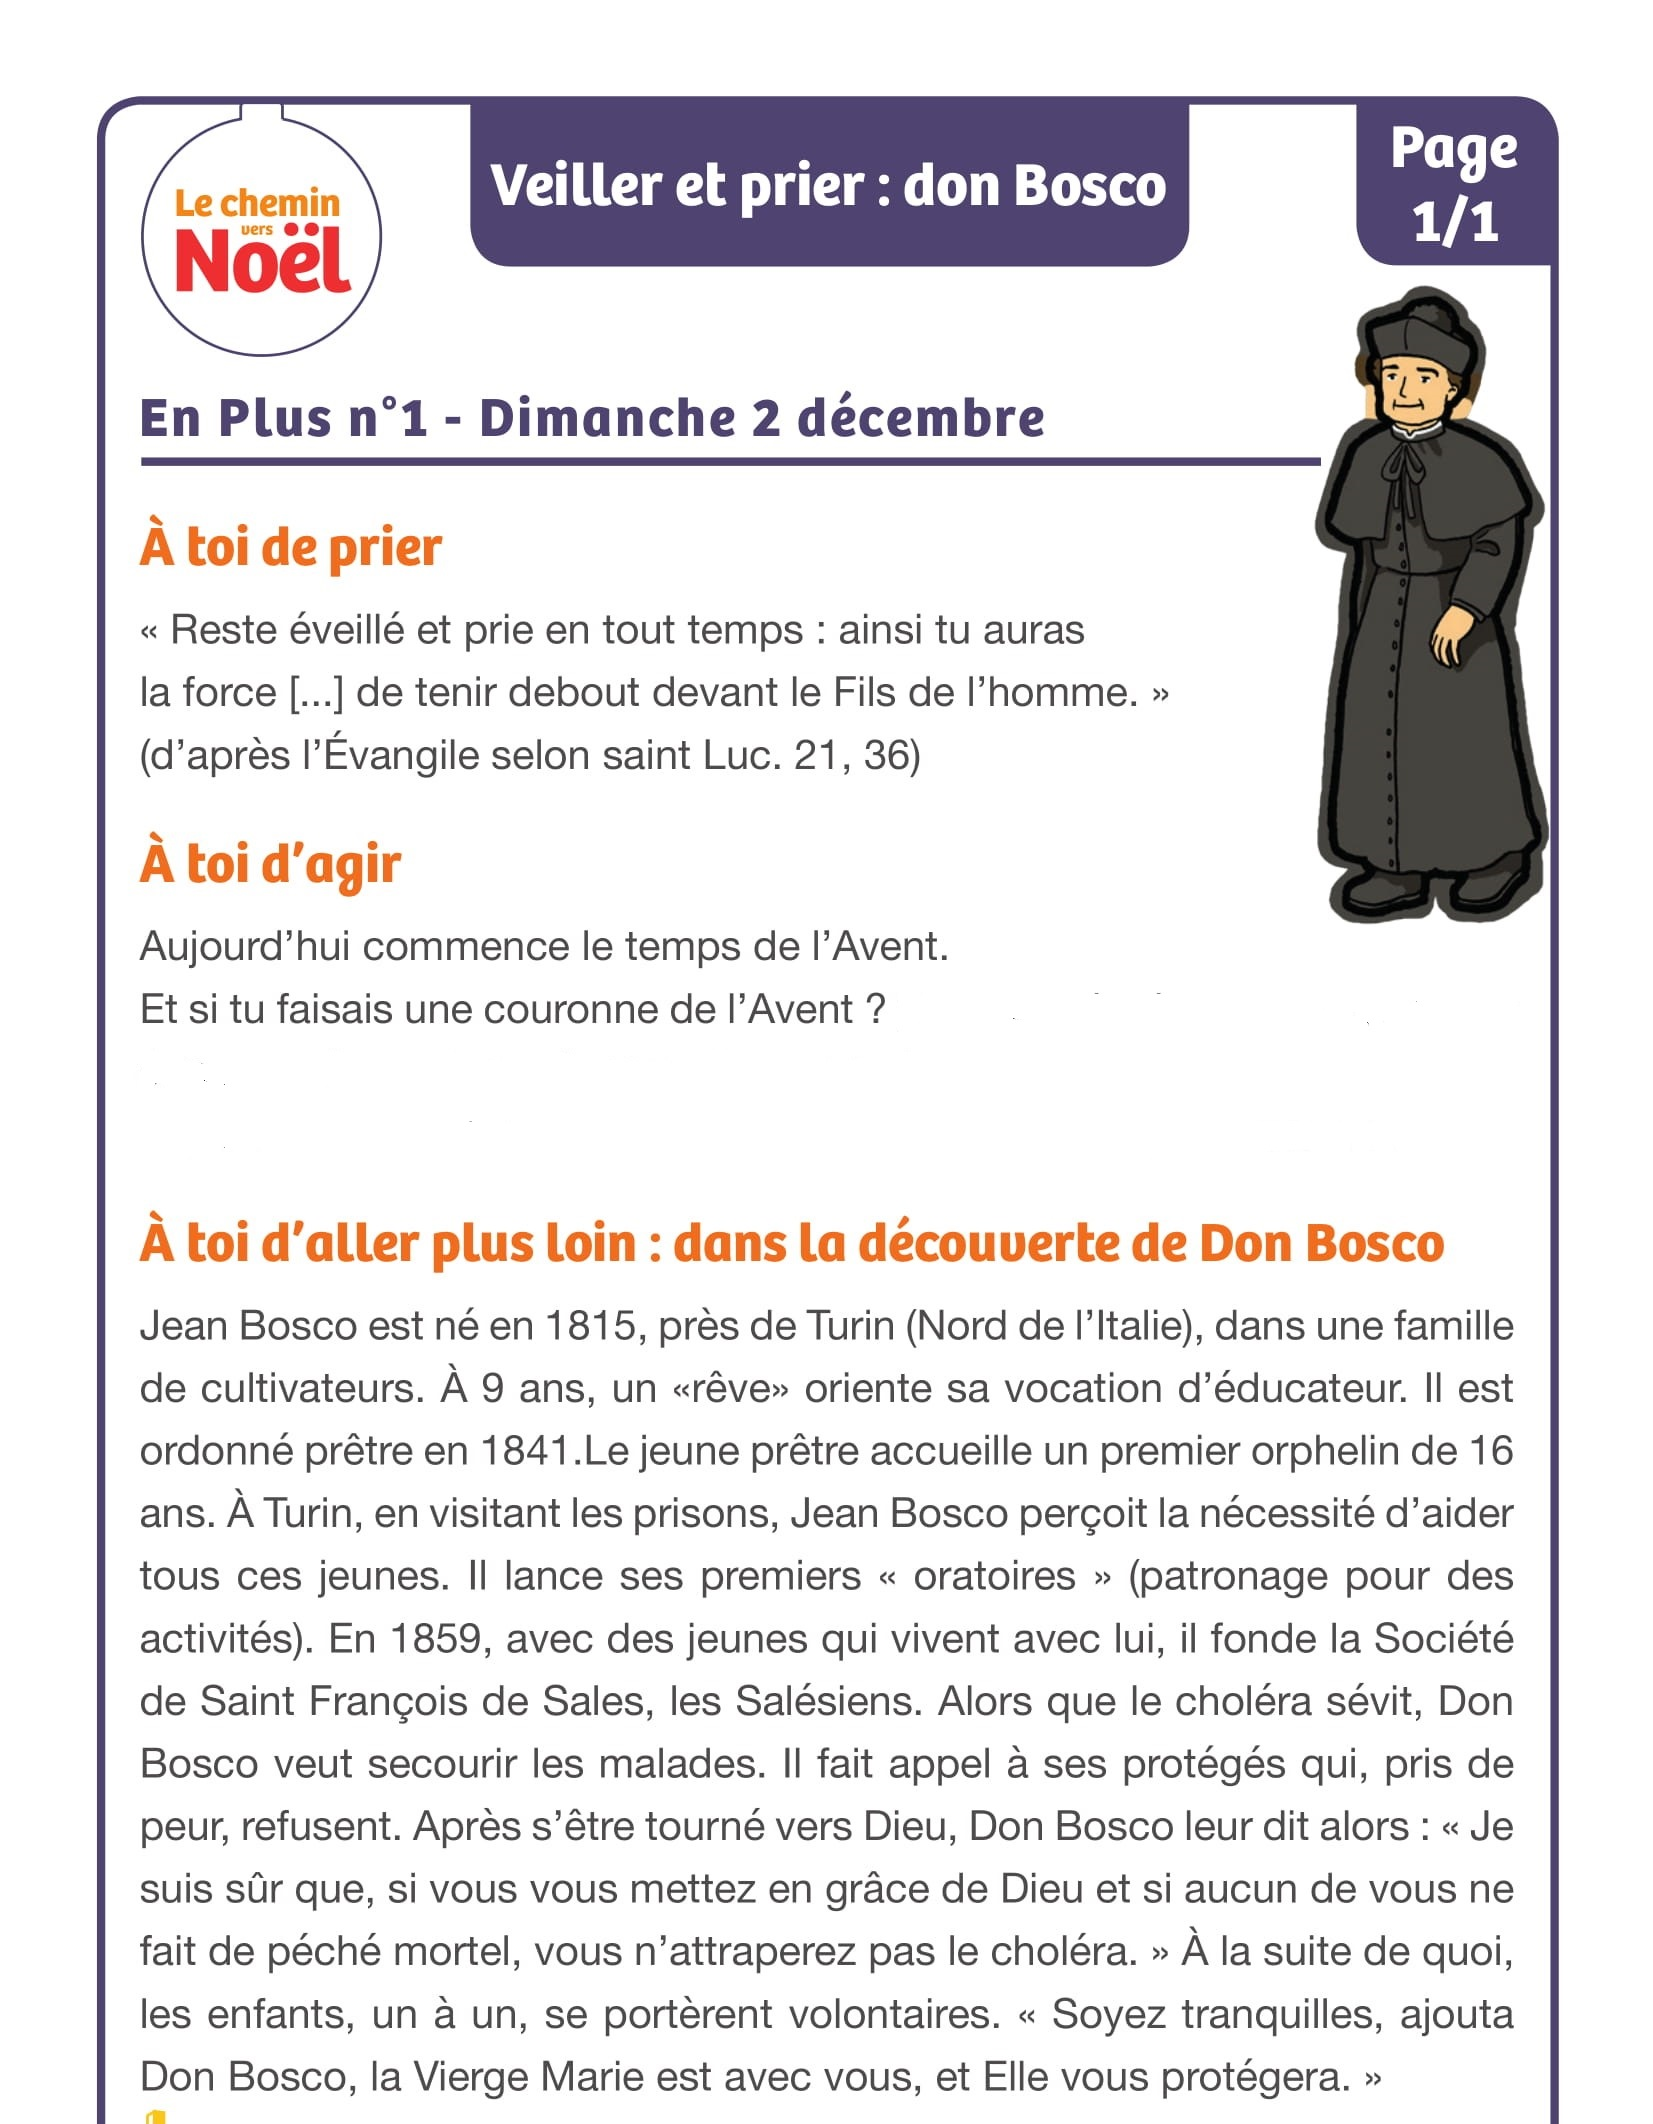 Vers NoëlDiocèse D'angers EnsembleEn Chemin L'eglise NXwPk8nO0